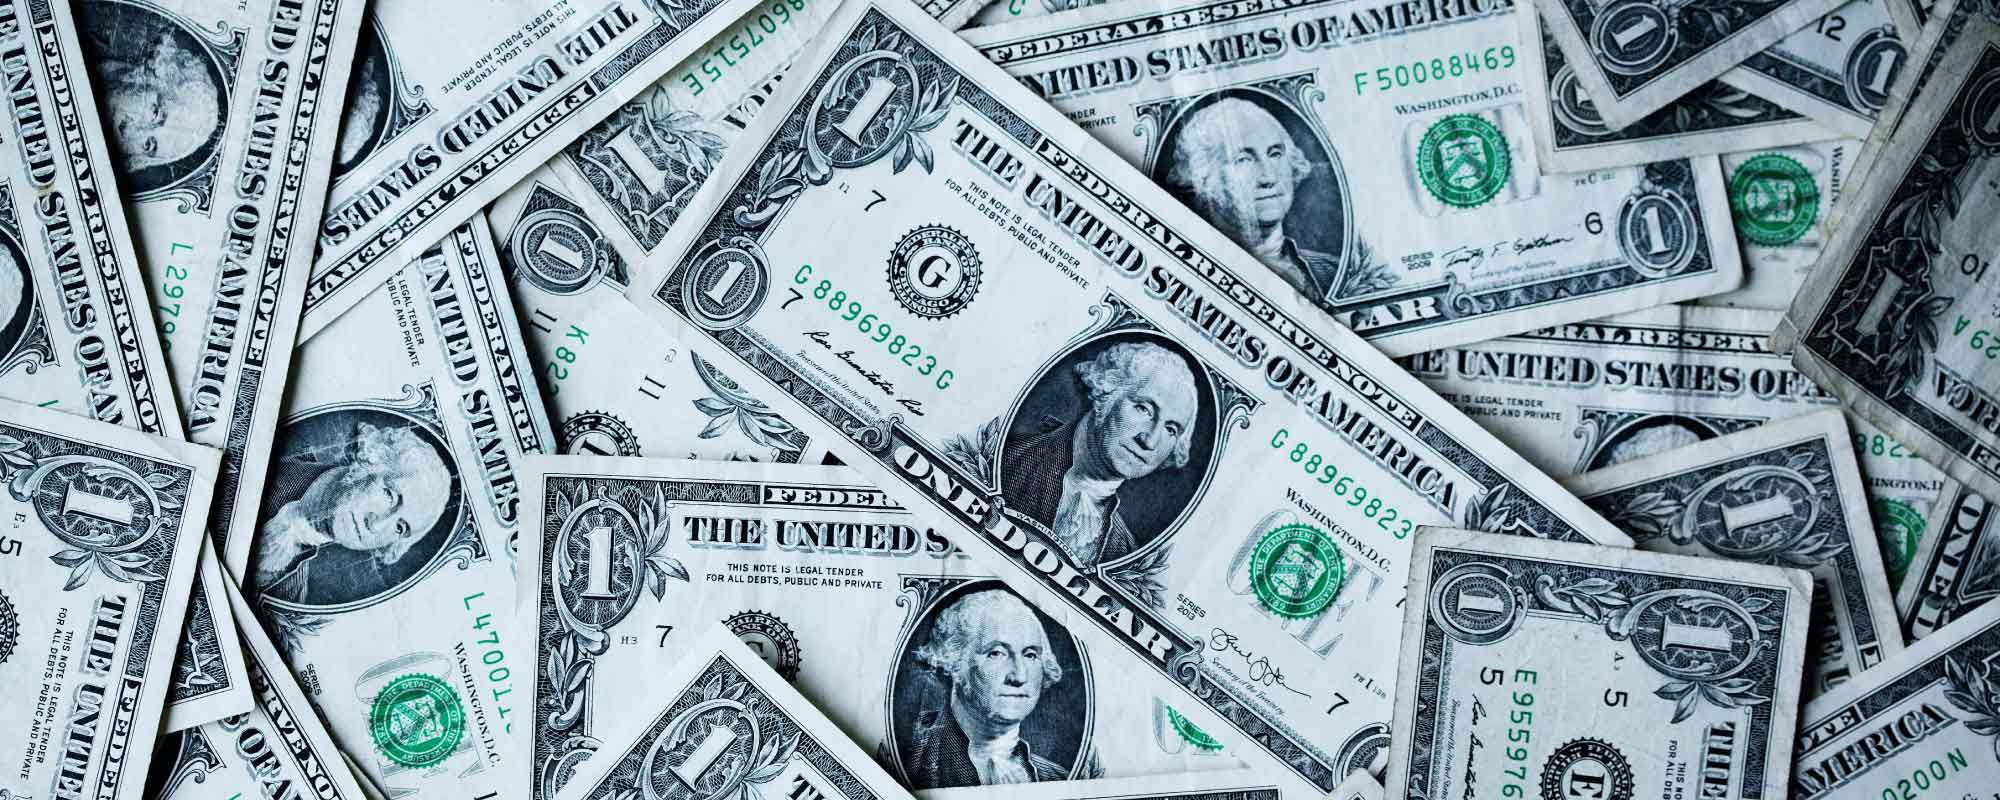 Earnest-Money-Deposit-Disputes